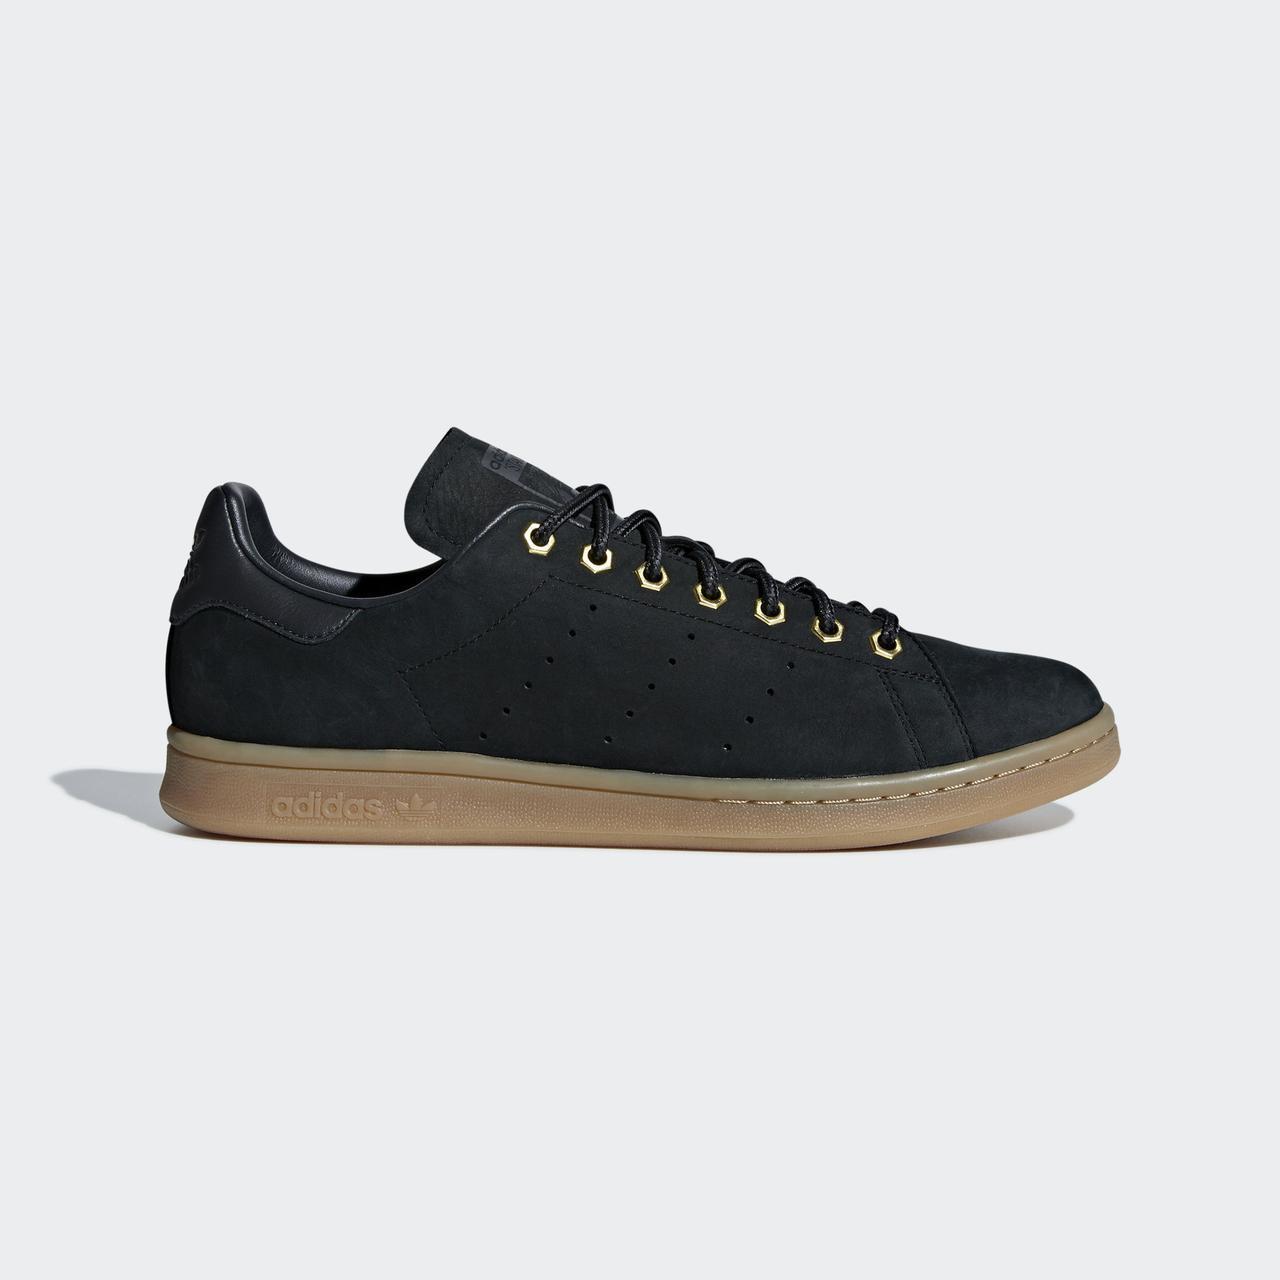 c63c57b2a5d6 Мужские кроссовки Adidas Stan Smith B37872 - 2018 2  продажа, цена в ...